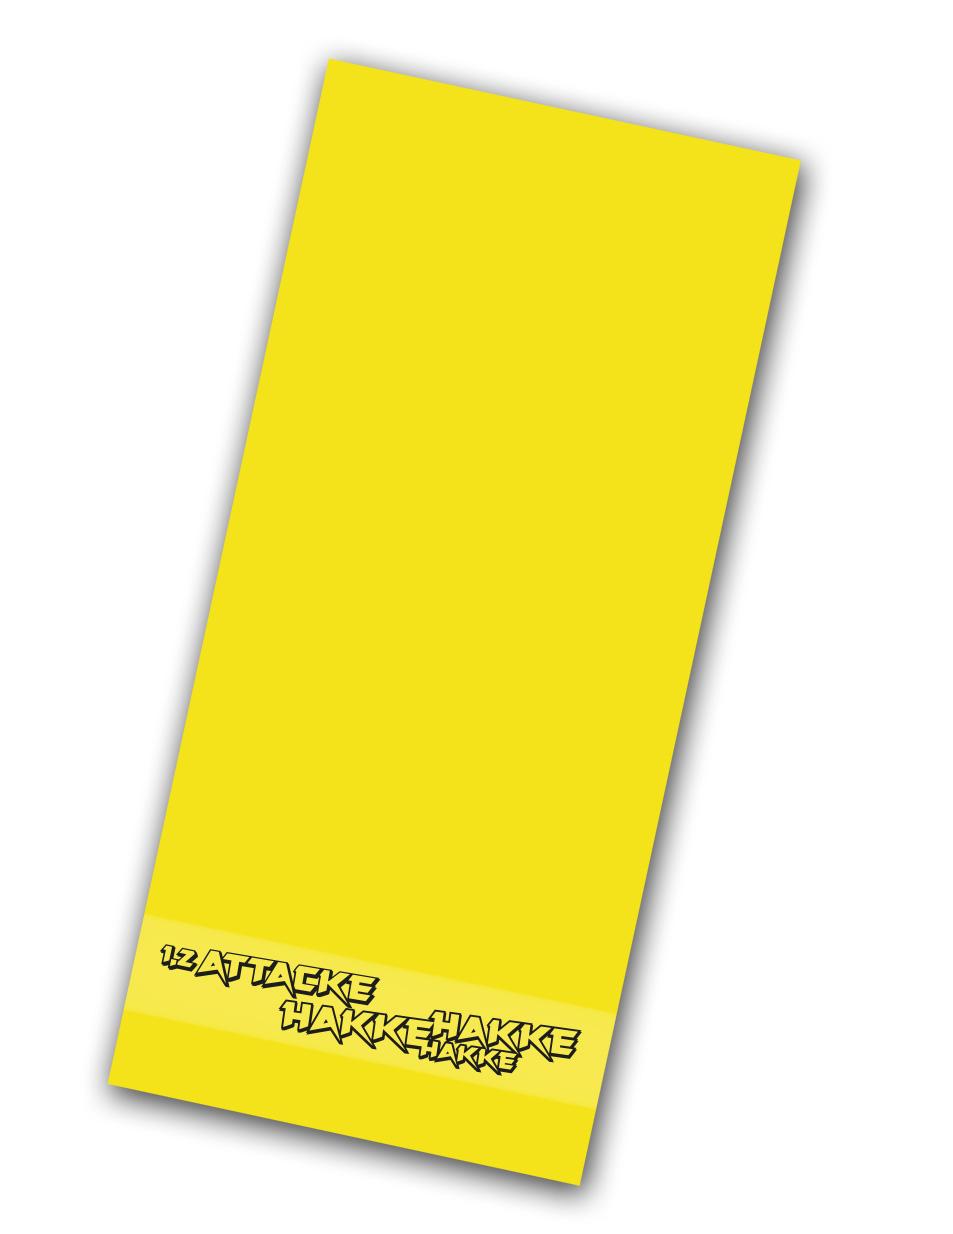 Hakke Hakke Hakke Handtuch schwarz auf gelb